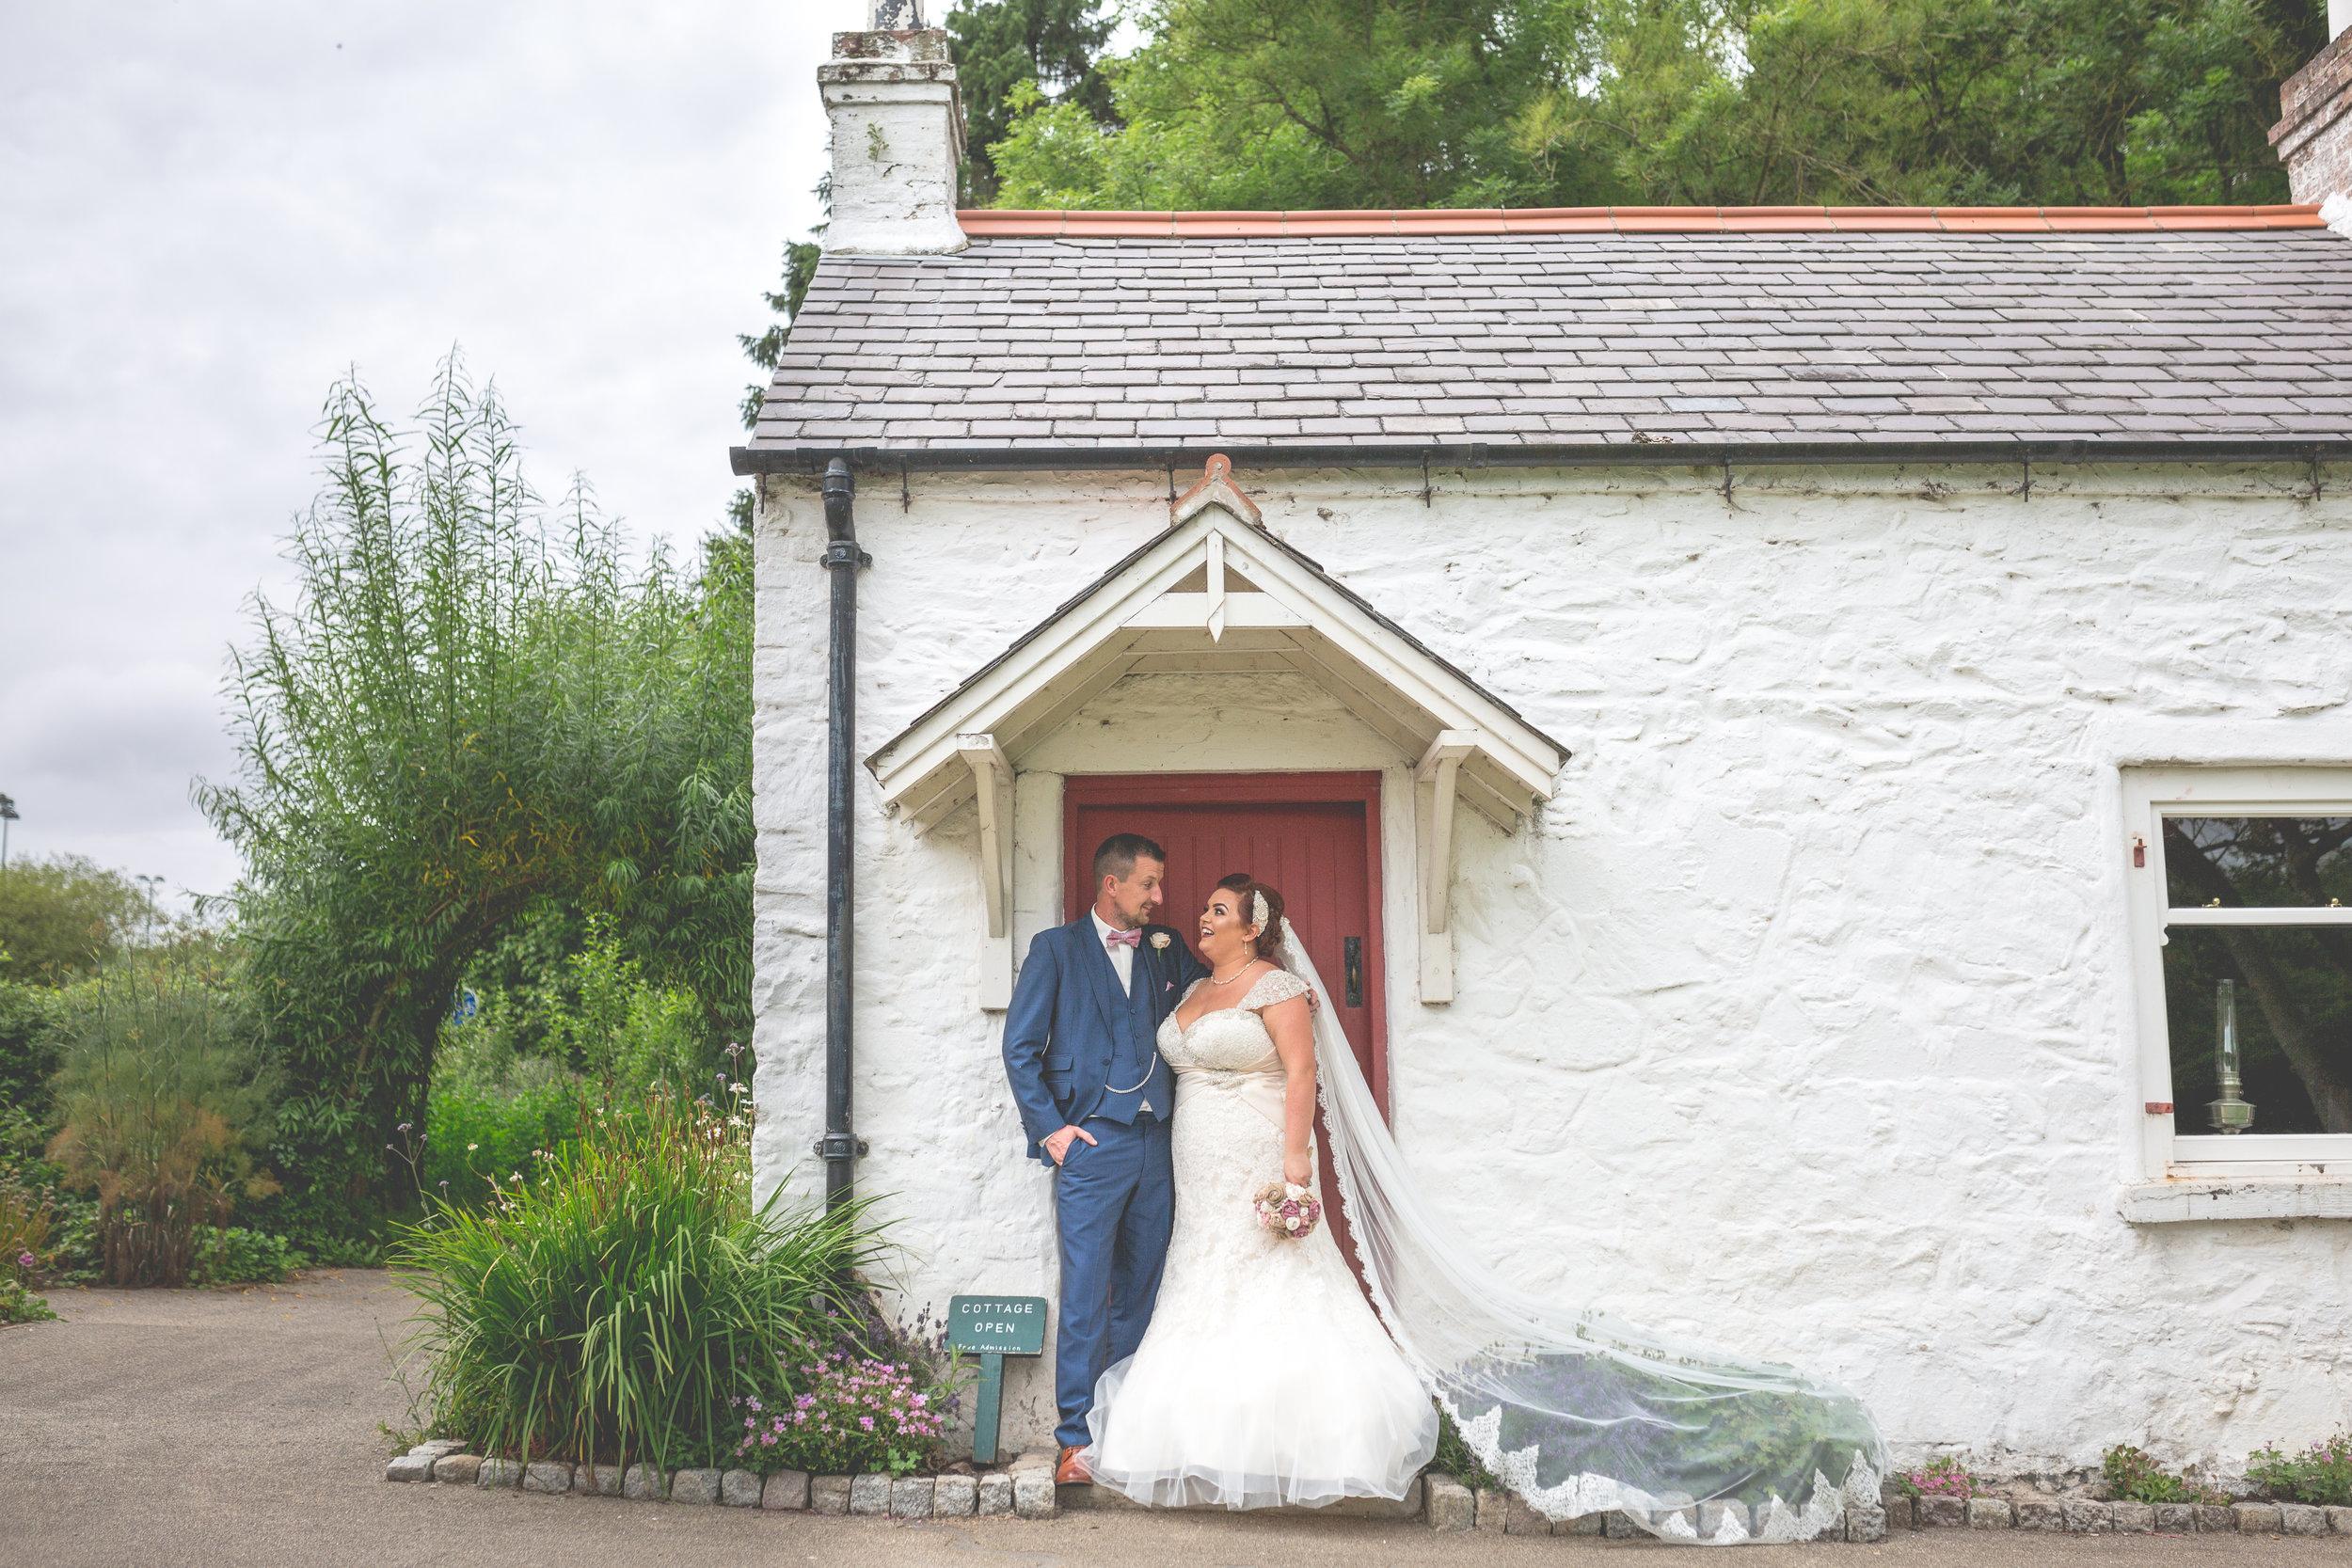 Antoinette & Stephen - Portraits   Brian McEwan Photography   Wedding Photographer Northern Ireland 6.jpg